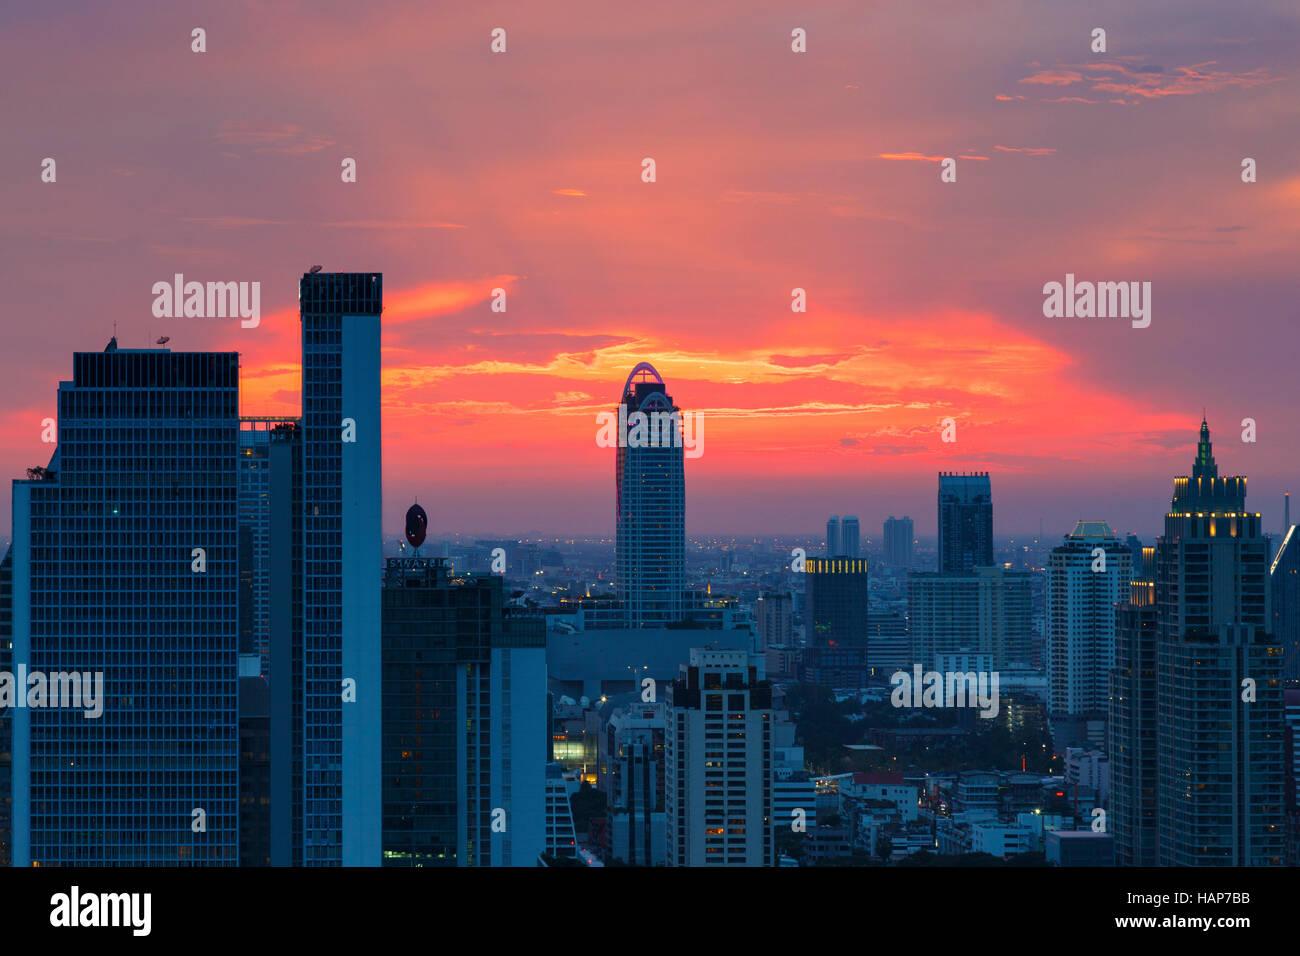 High Rise Building Bangkok Stockfotos  U0026 High Rise Building